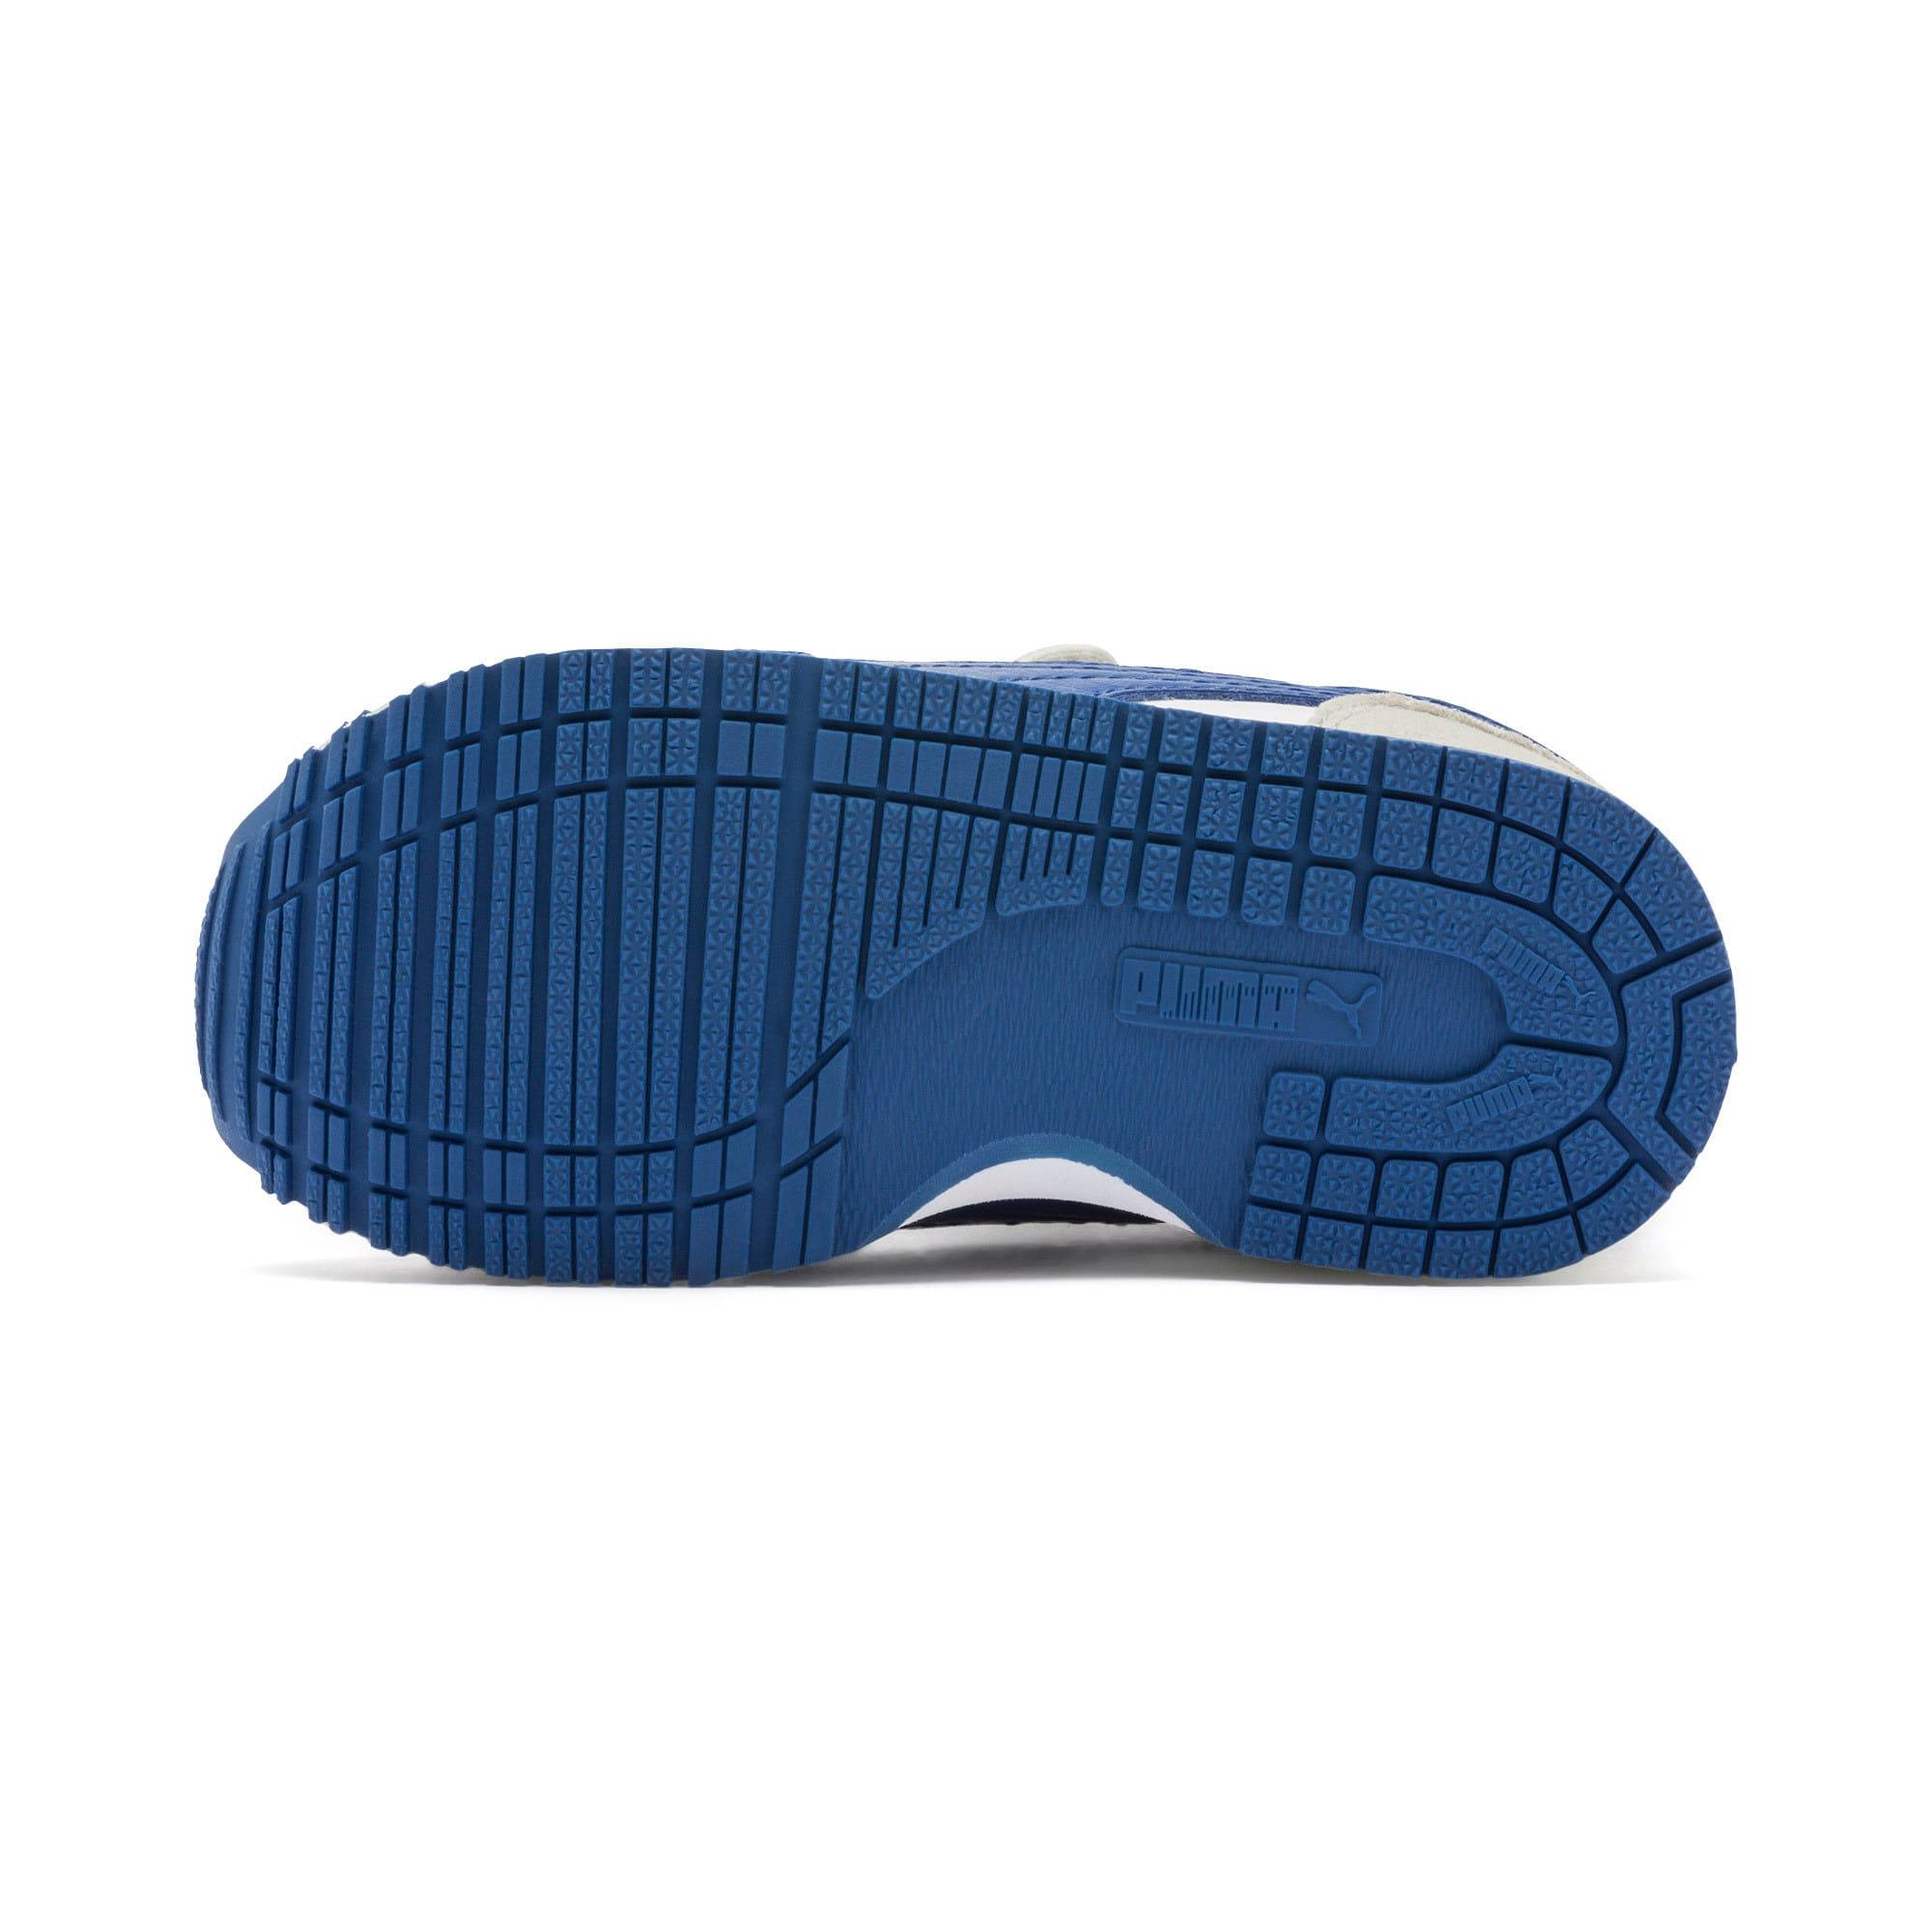 Thumbnail 4 of Cabana Racer SL Toddler Shoes, Puma White-Galaxy Blue, medium